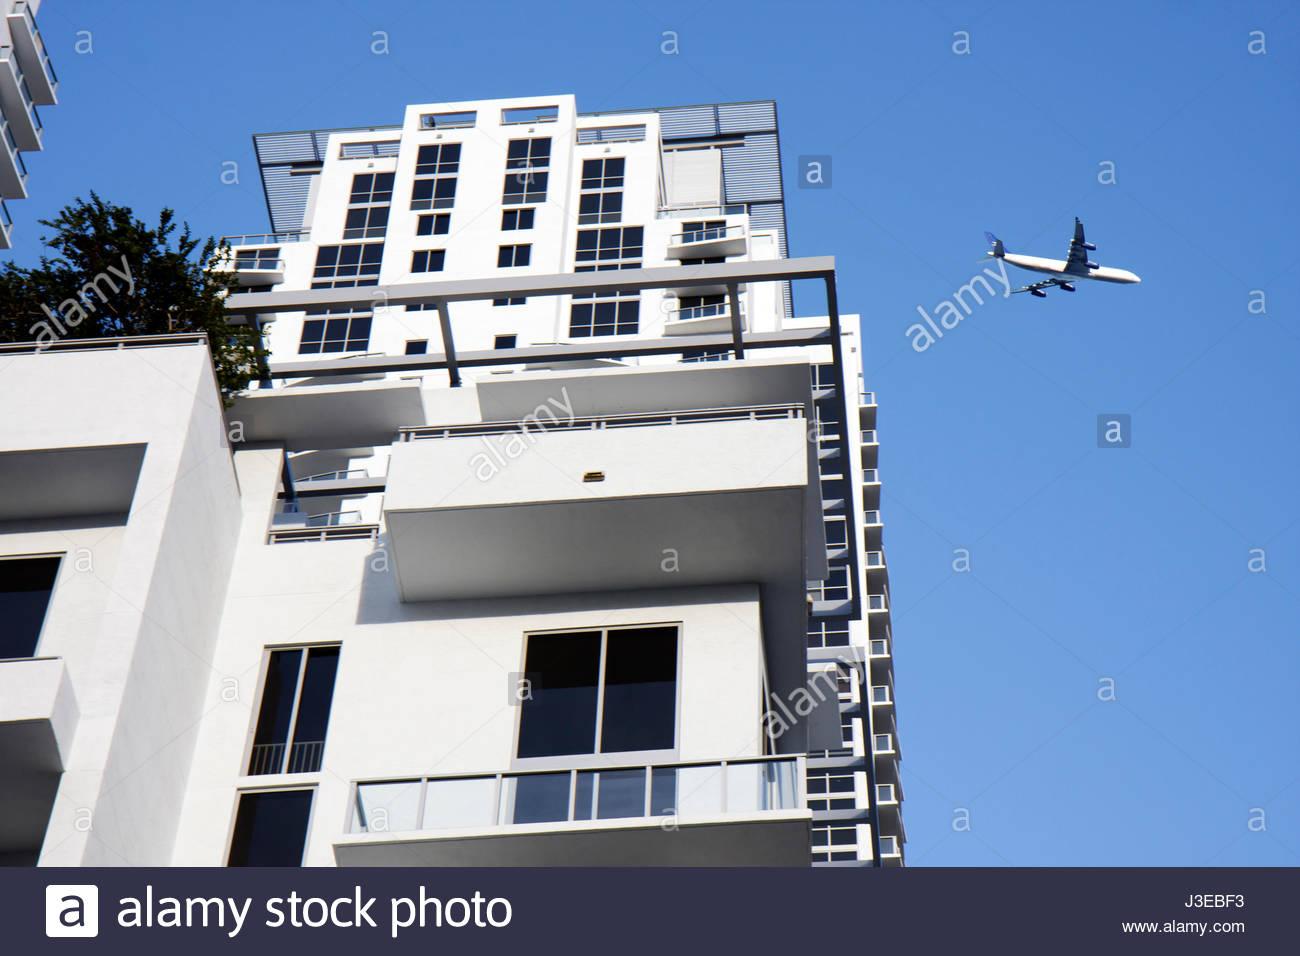 Miami Florida Brickell Area building high rise multi-family dwelling ...